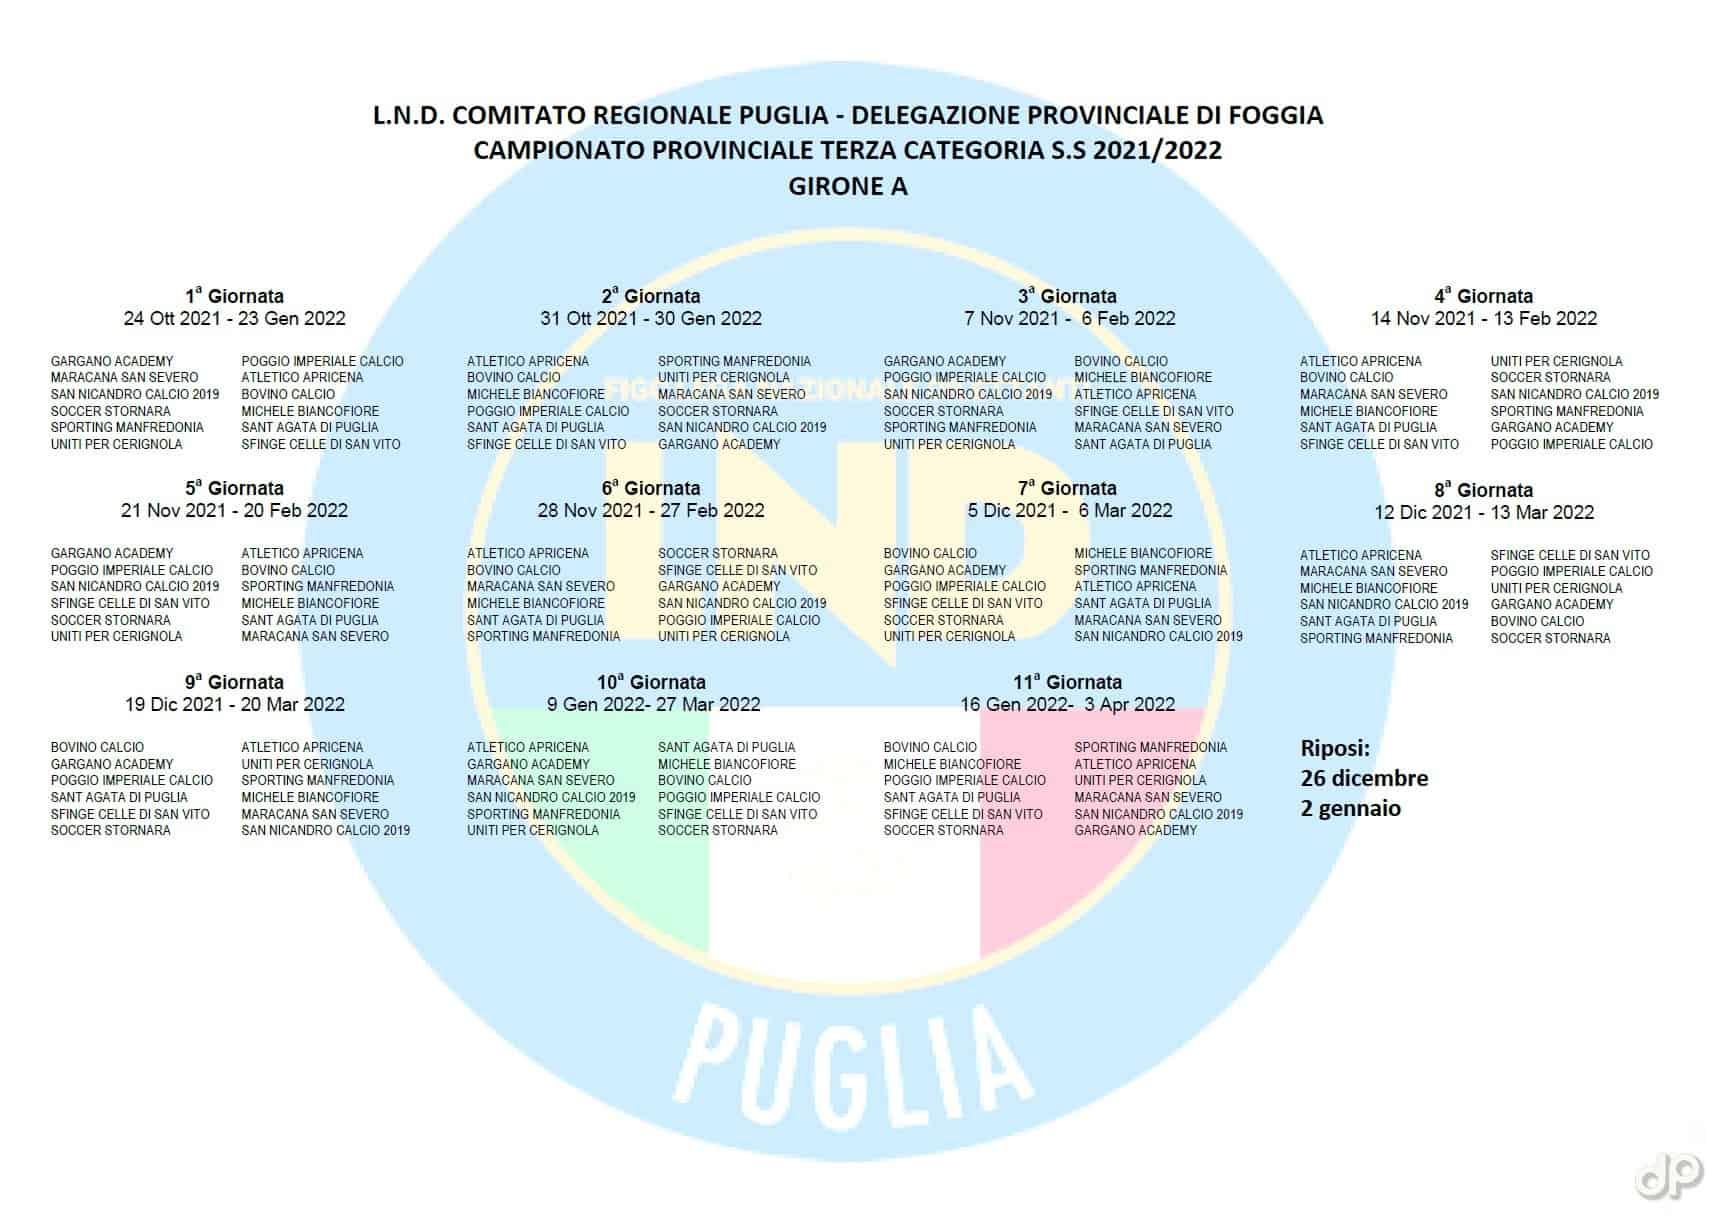 Calendario Terza Categoria Foggia 2021-22